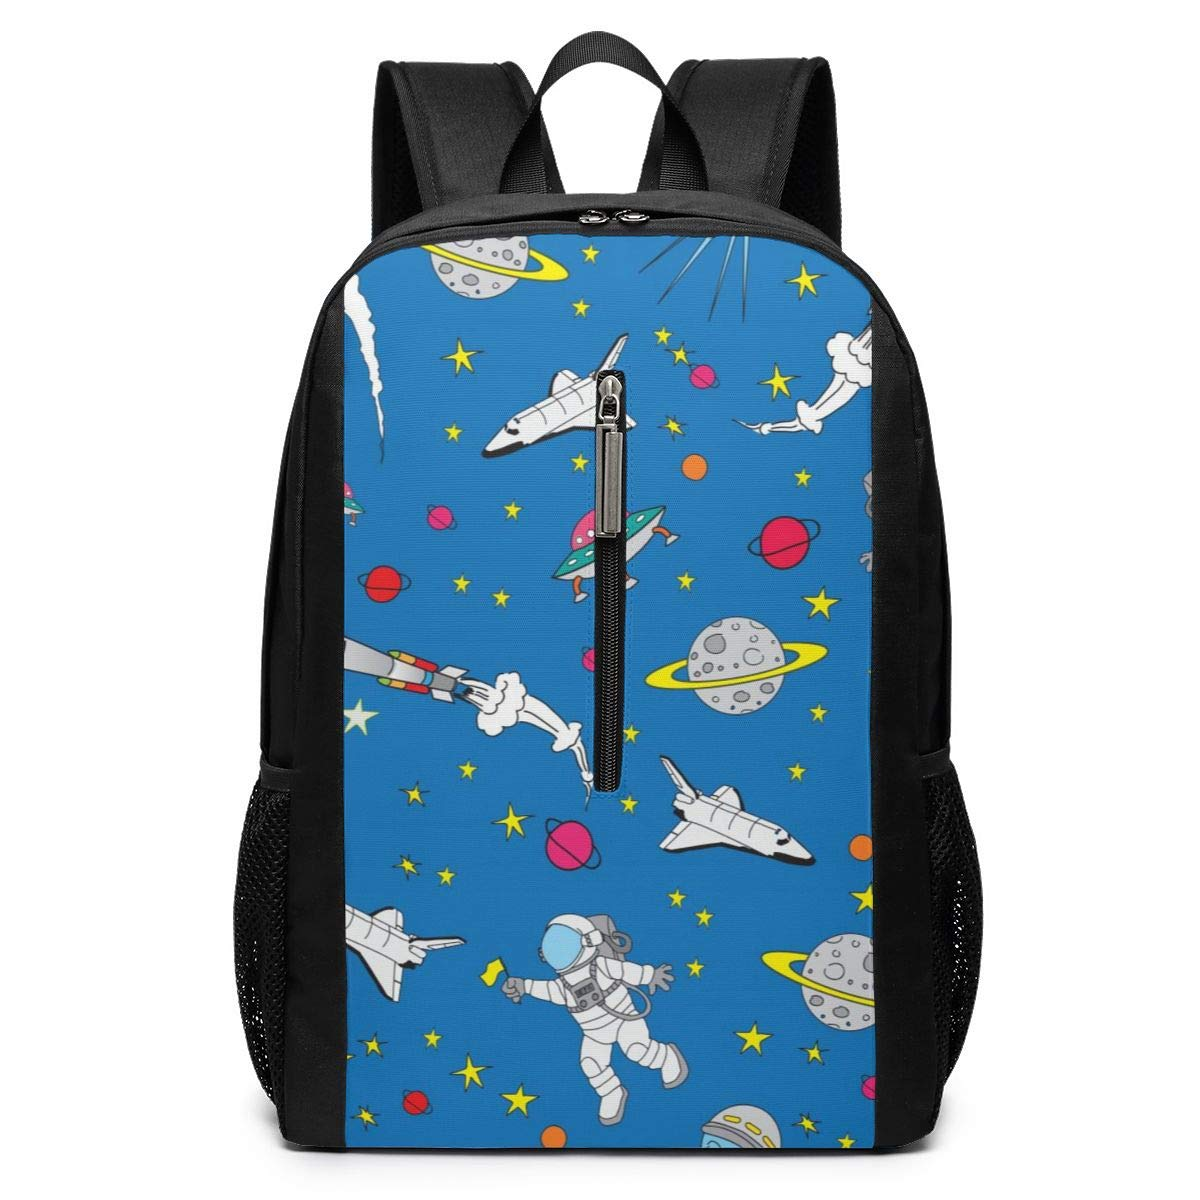 Backpacks Astronaut Shoulder Notebook Multipurpose